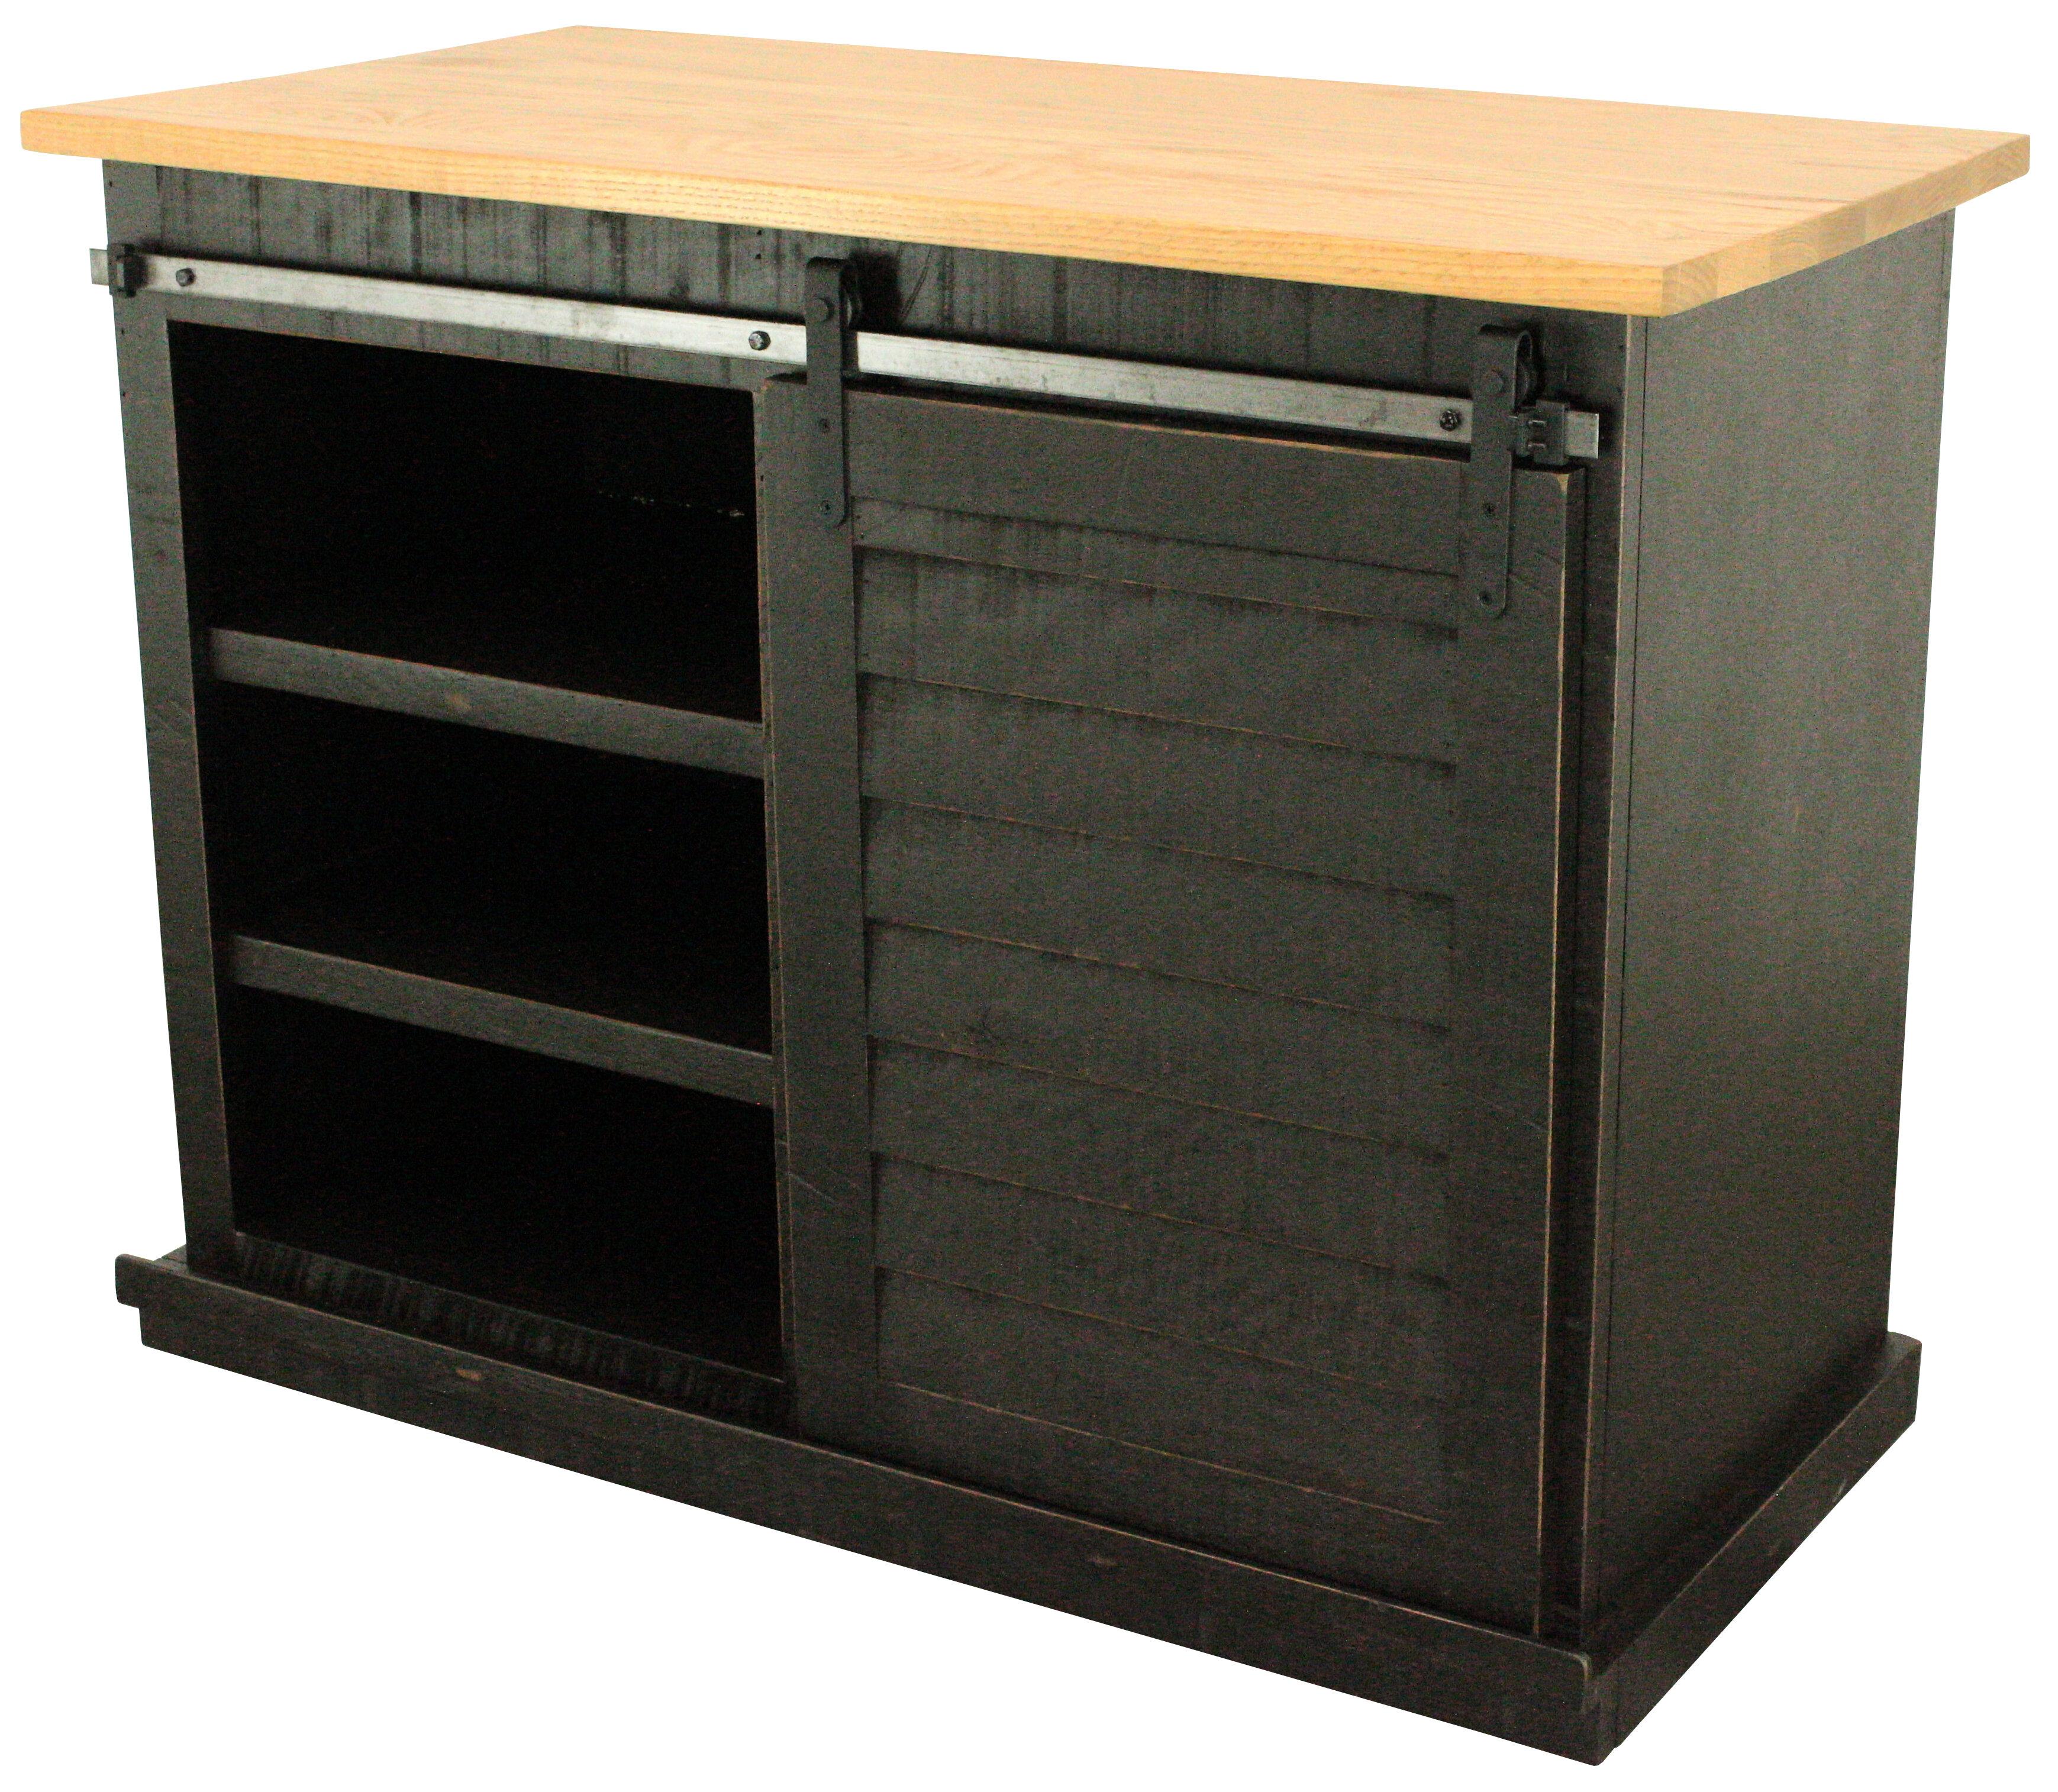 Home Furniture Diy Small Kitchen Island Cupboard Drawers Butchers Block Storage Unit Rustic Oak Top Kisetsu System Co Jp